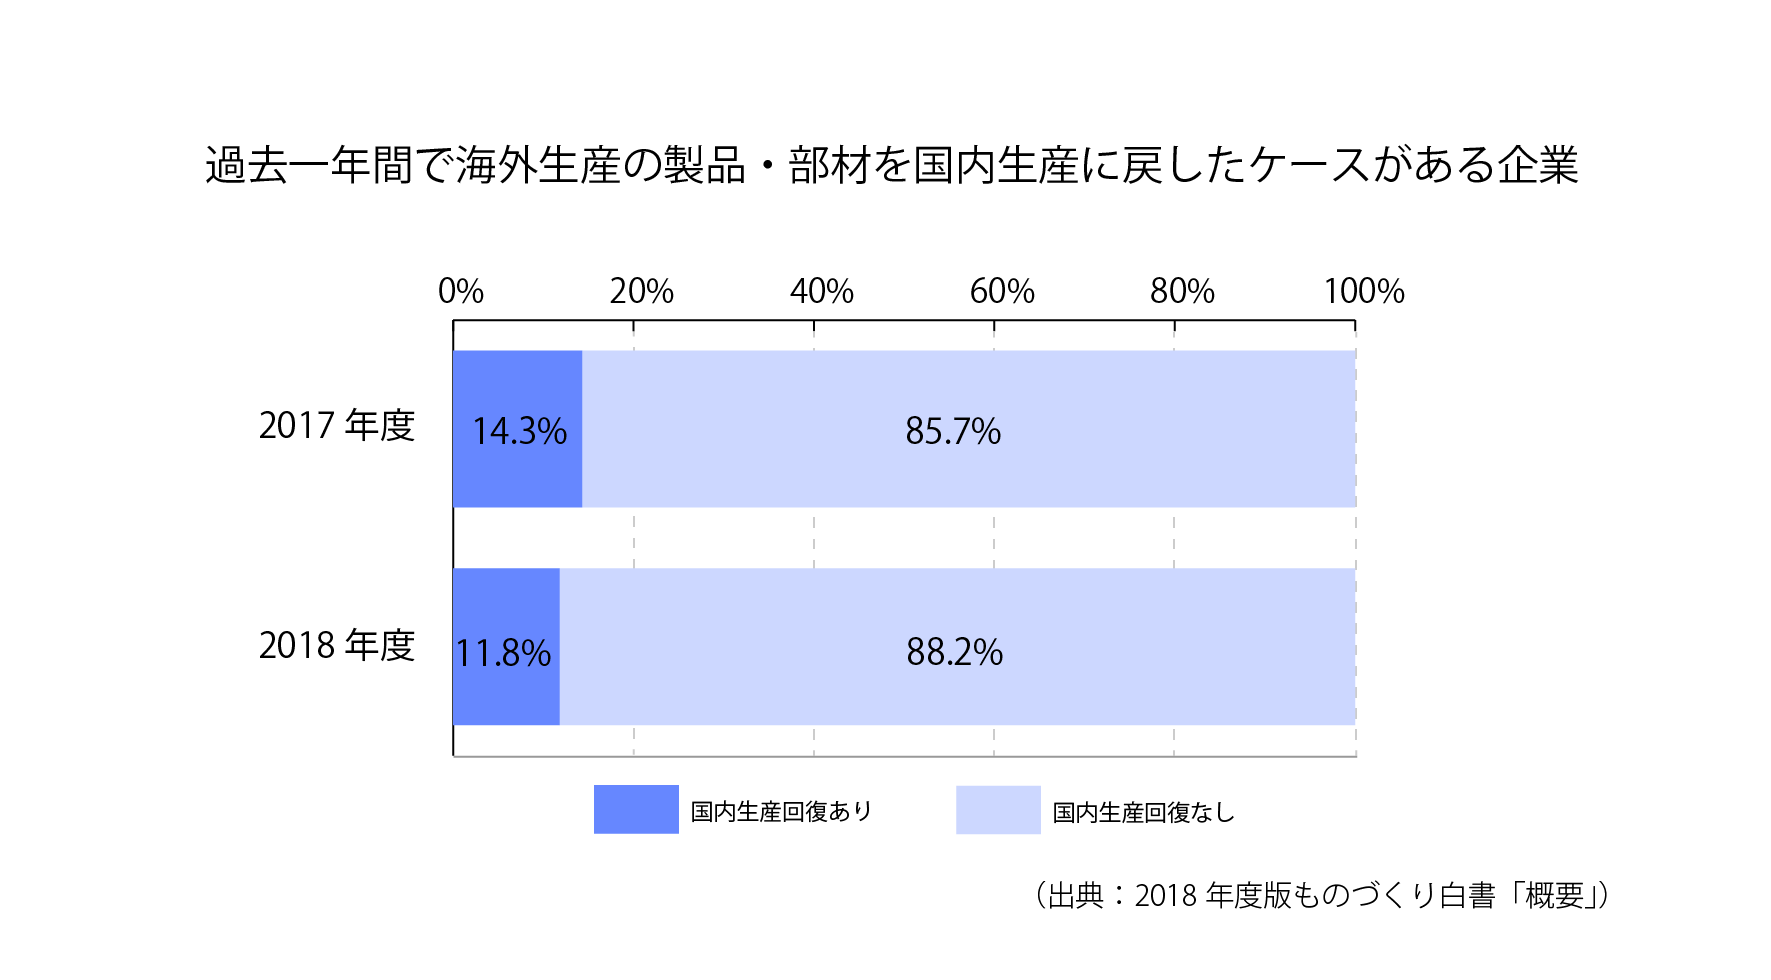 [S7-1]過去一年間で海外生産の製品・部材を国内生産に戻したケースがある企業